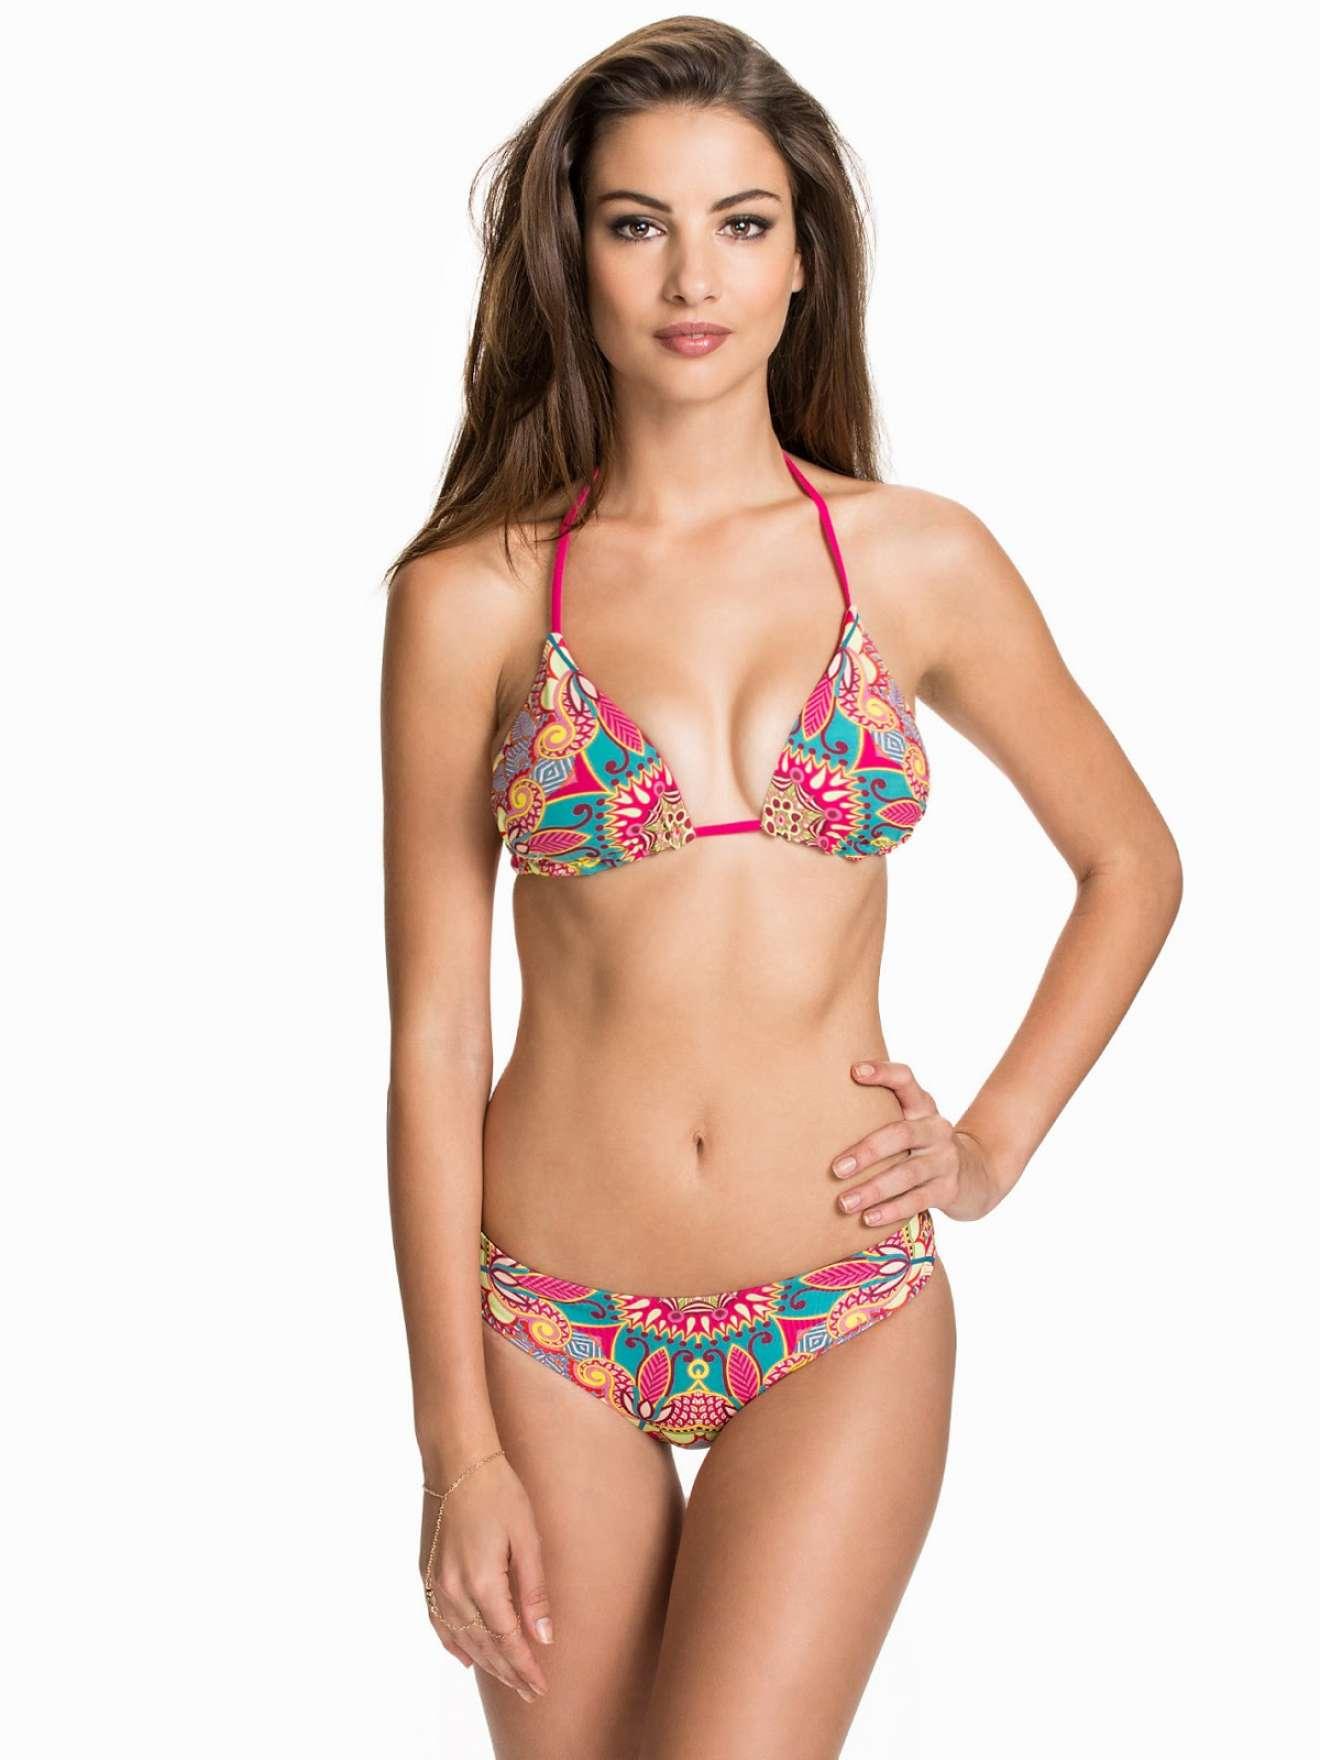 Katherine Henderson – Bikini Photoshoot